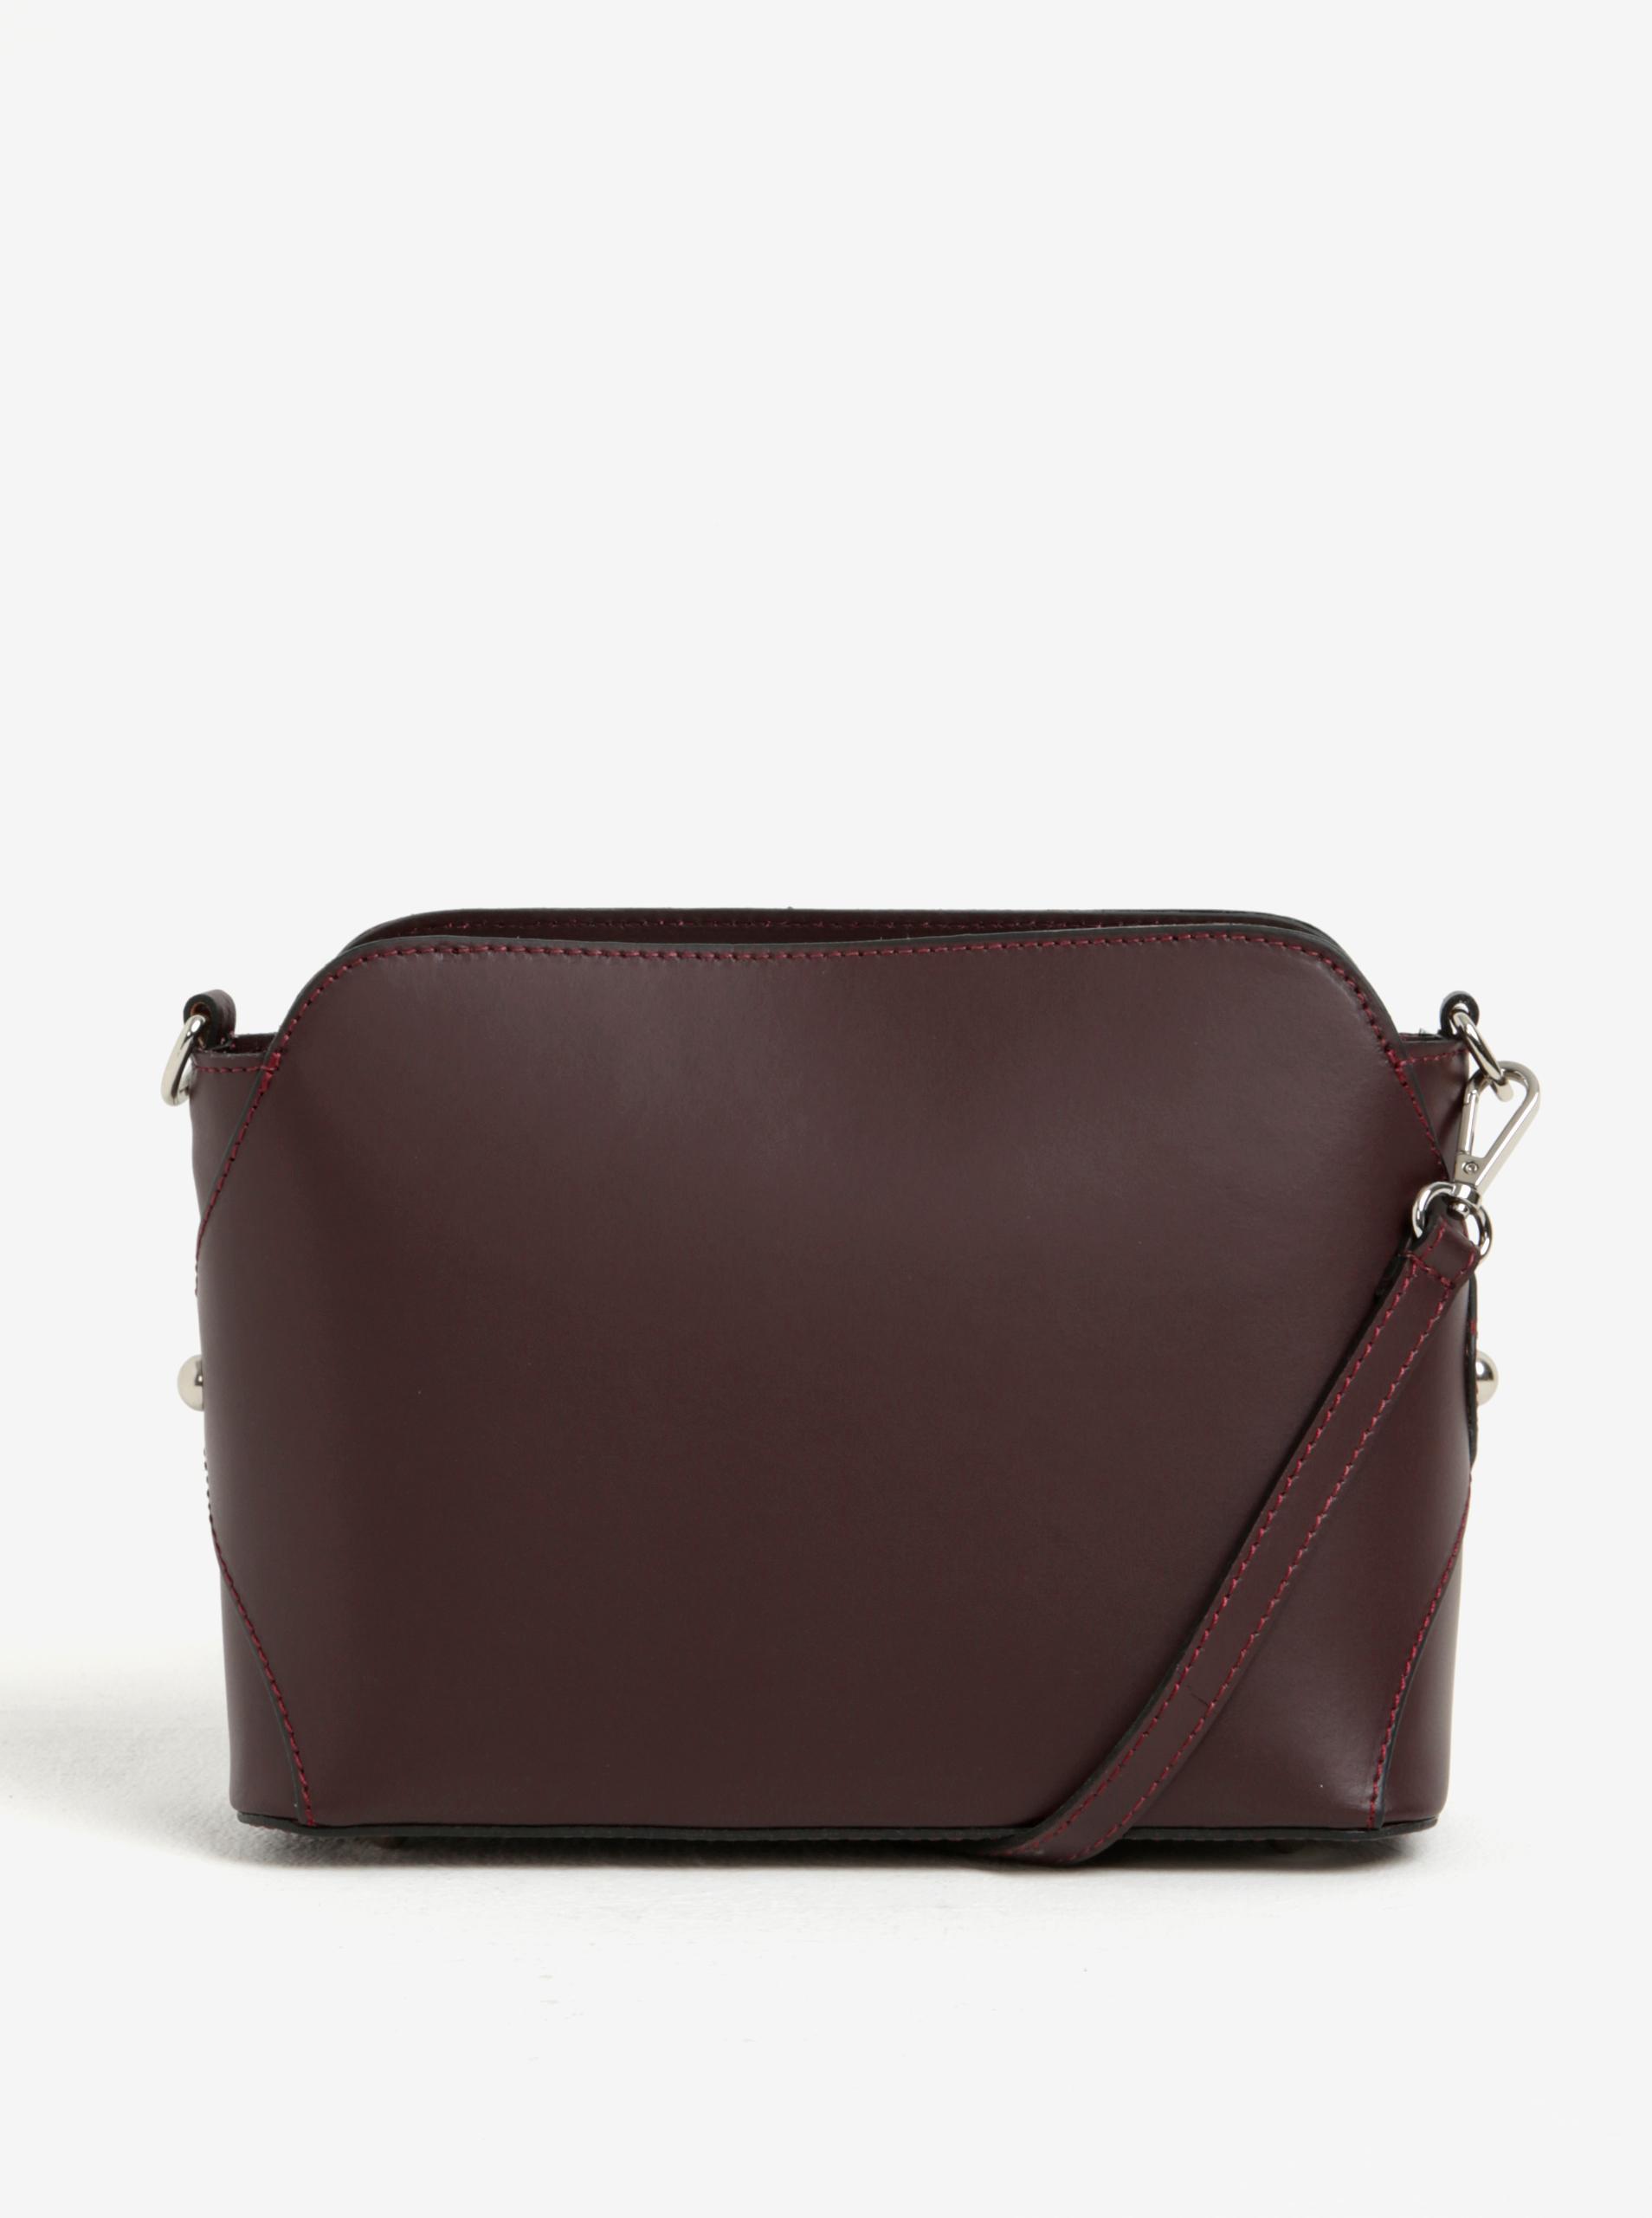 KARA Ženske torbice vinsko rdeča